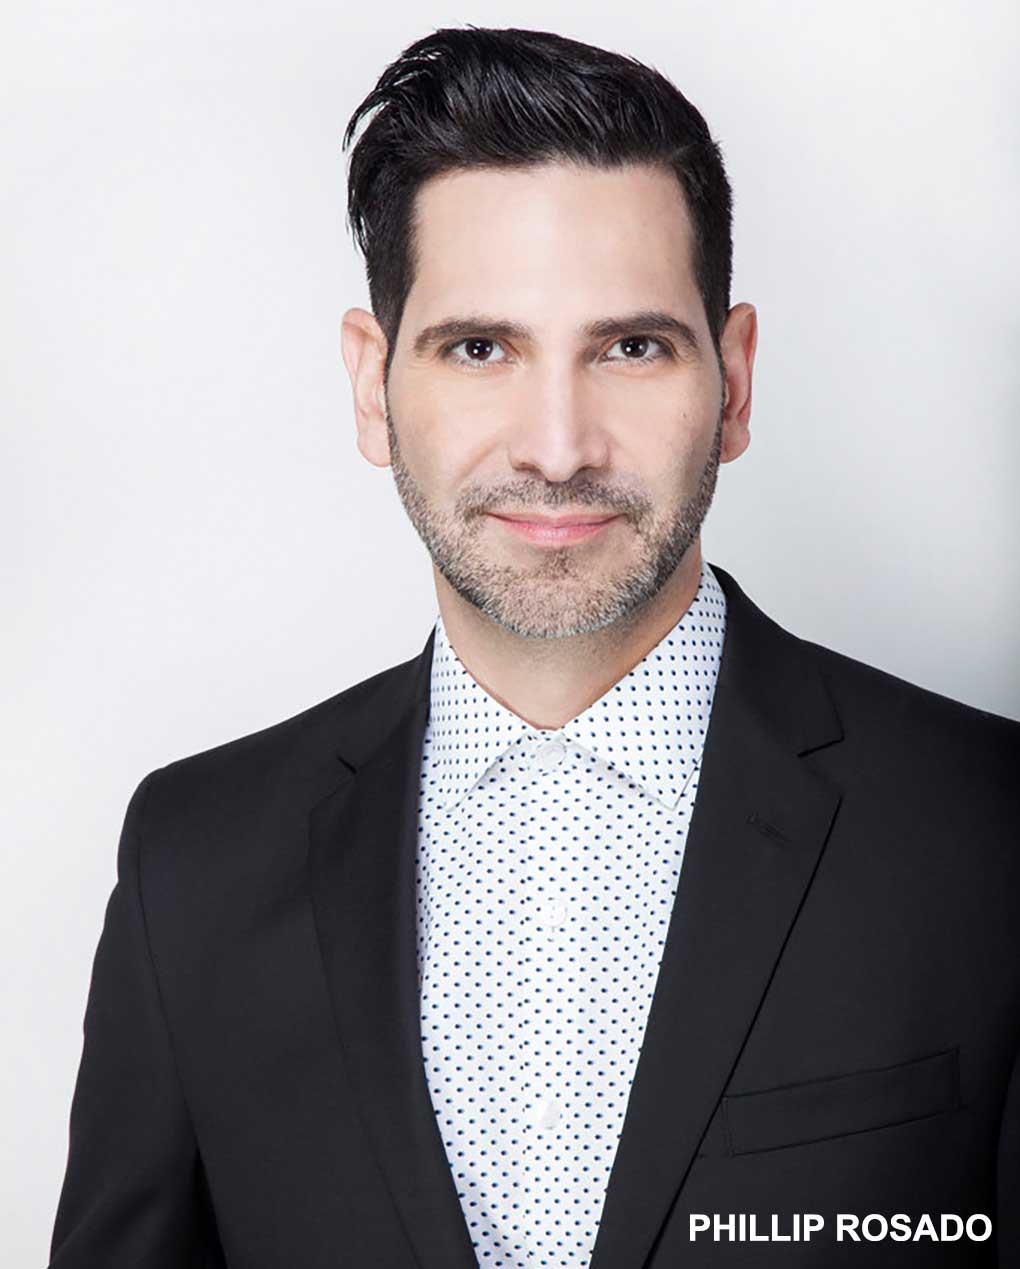 Philip Rosado | Educe Salon Owner